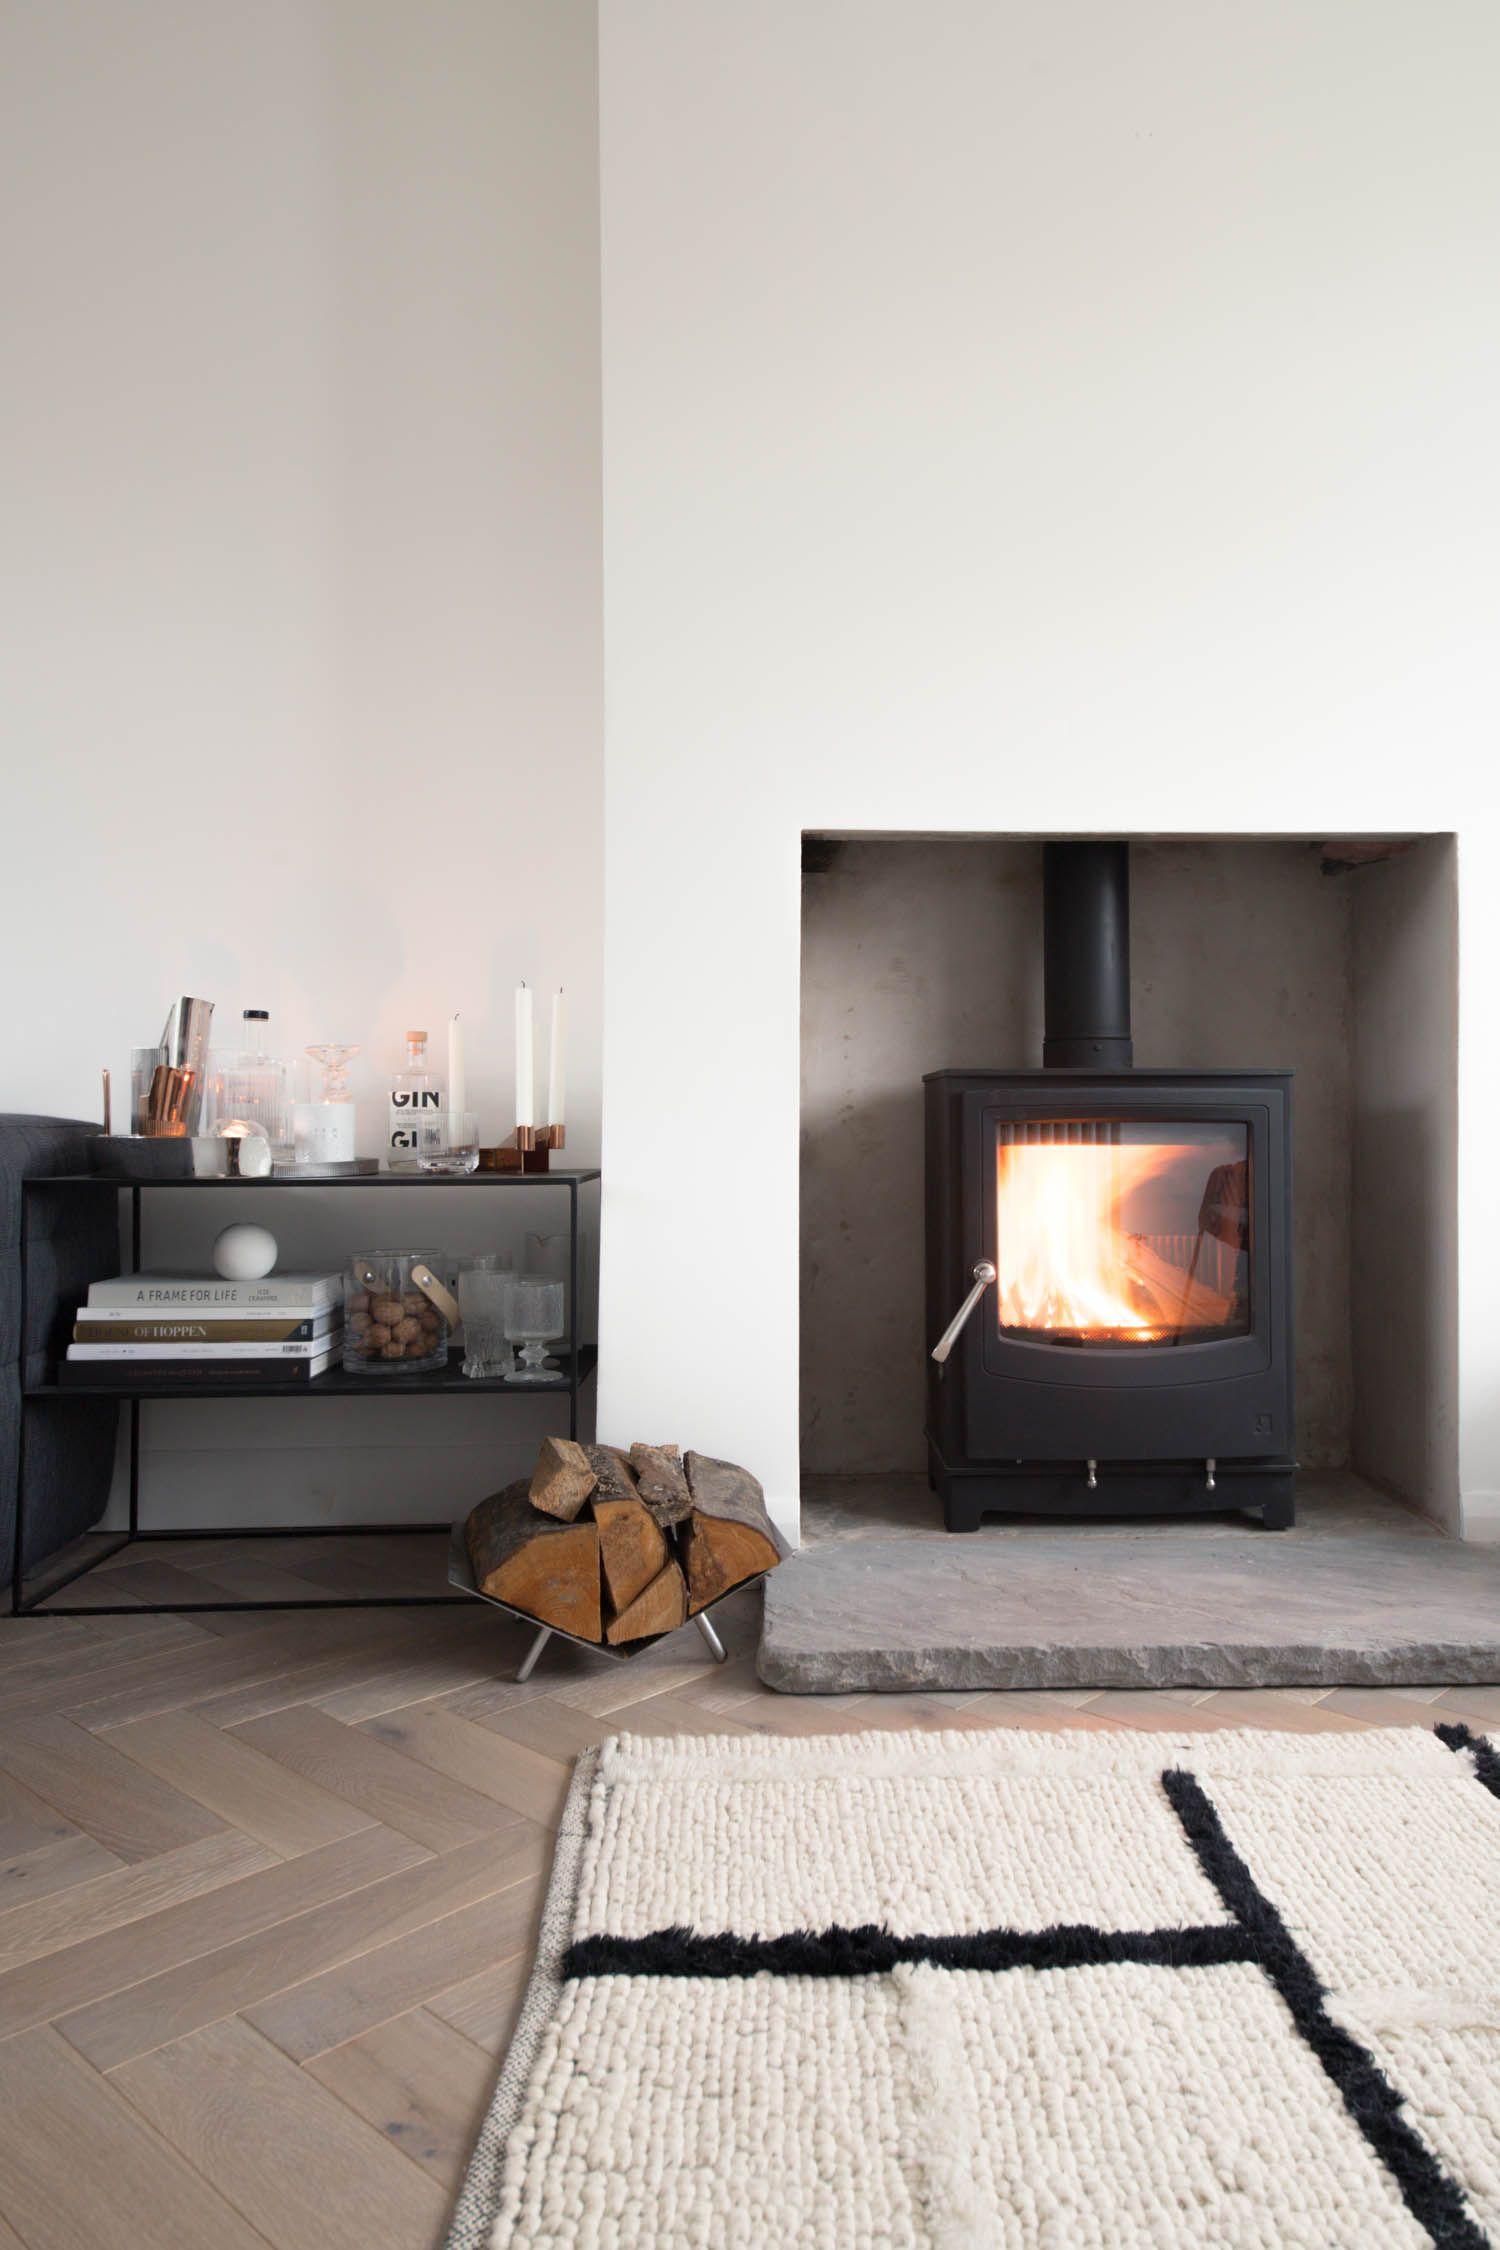 Installing A Wood Burning Stove A Step By Step Guide Log Burner Living Room Modern Wood Burning Stoves Wood Stove Installation